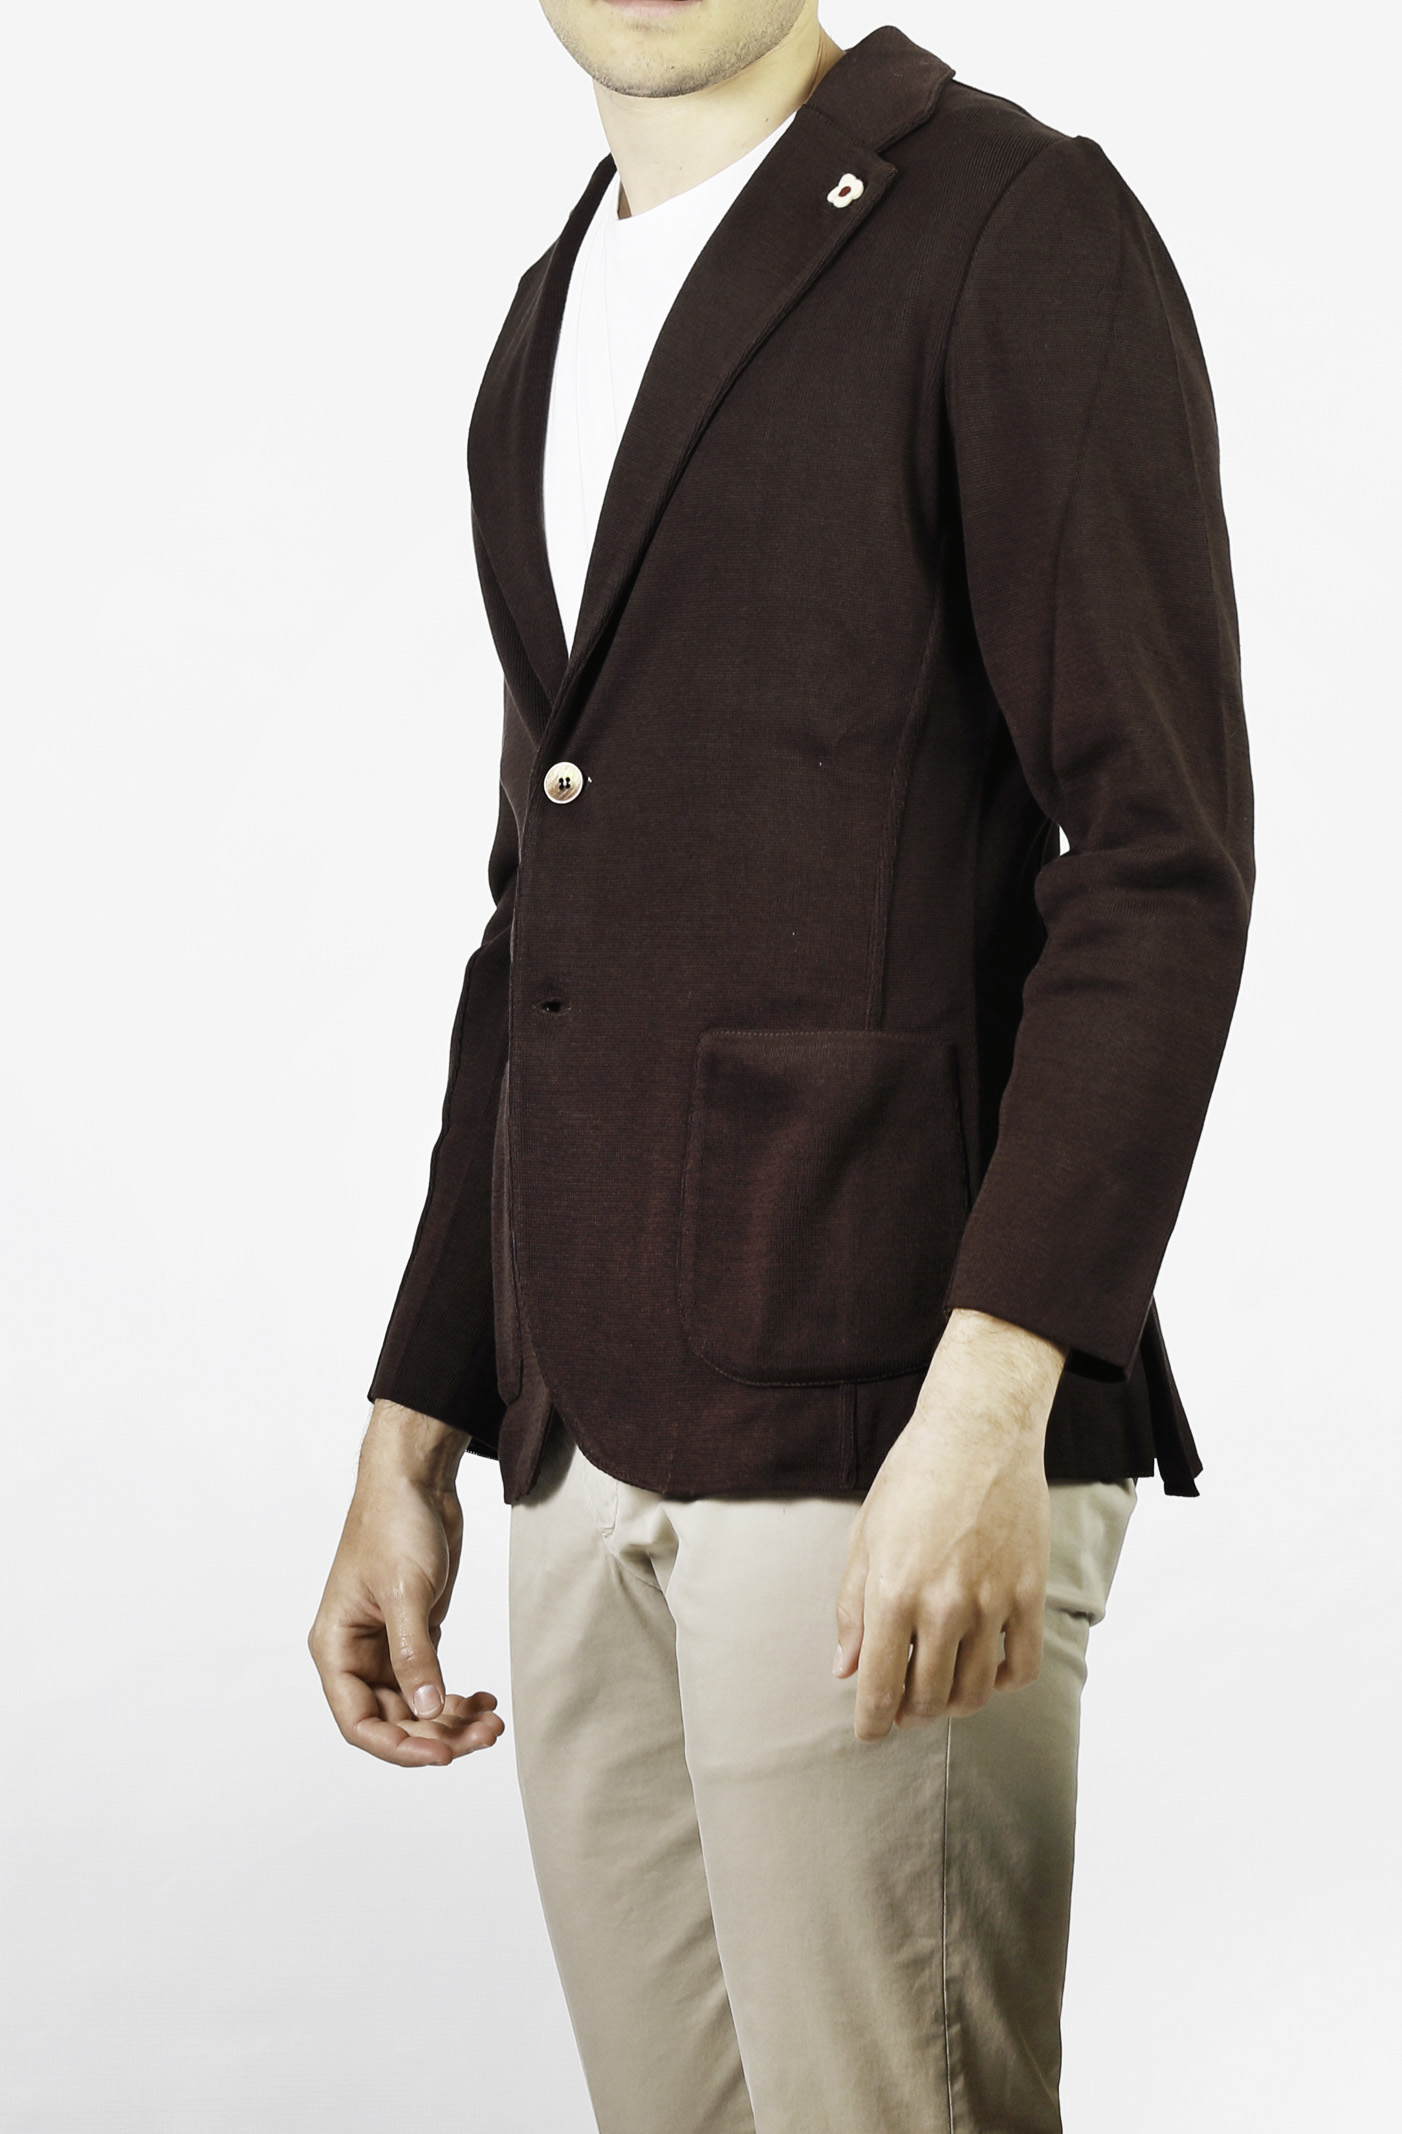 COTTON KNIT JACKET LARDINI | Jackets | ELLJM56-EL56000450